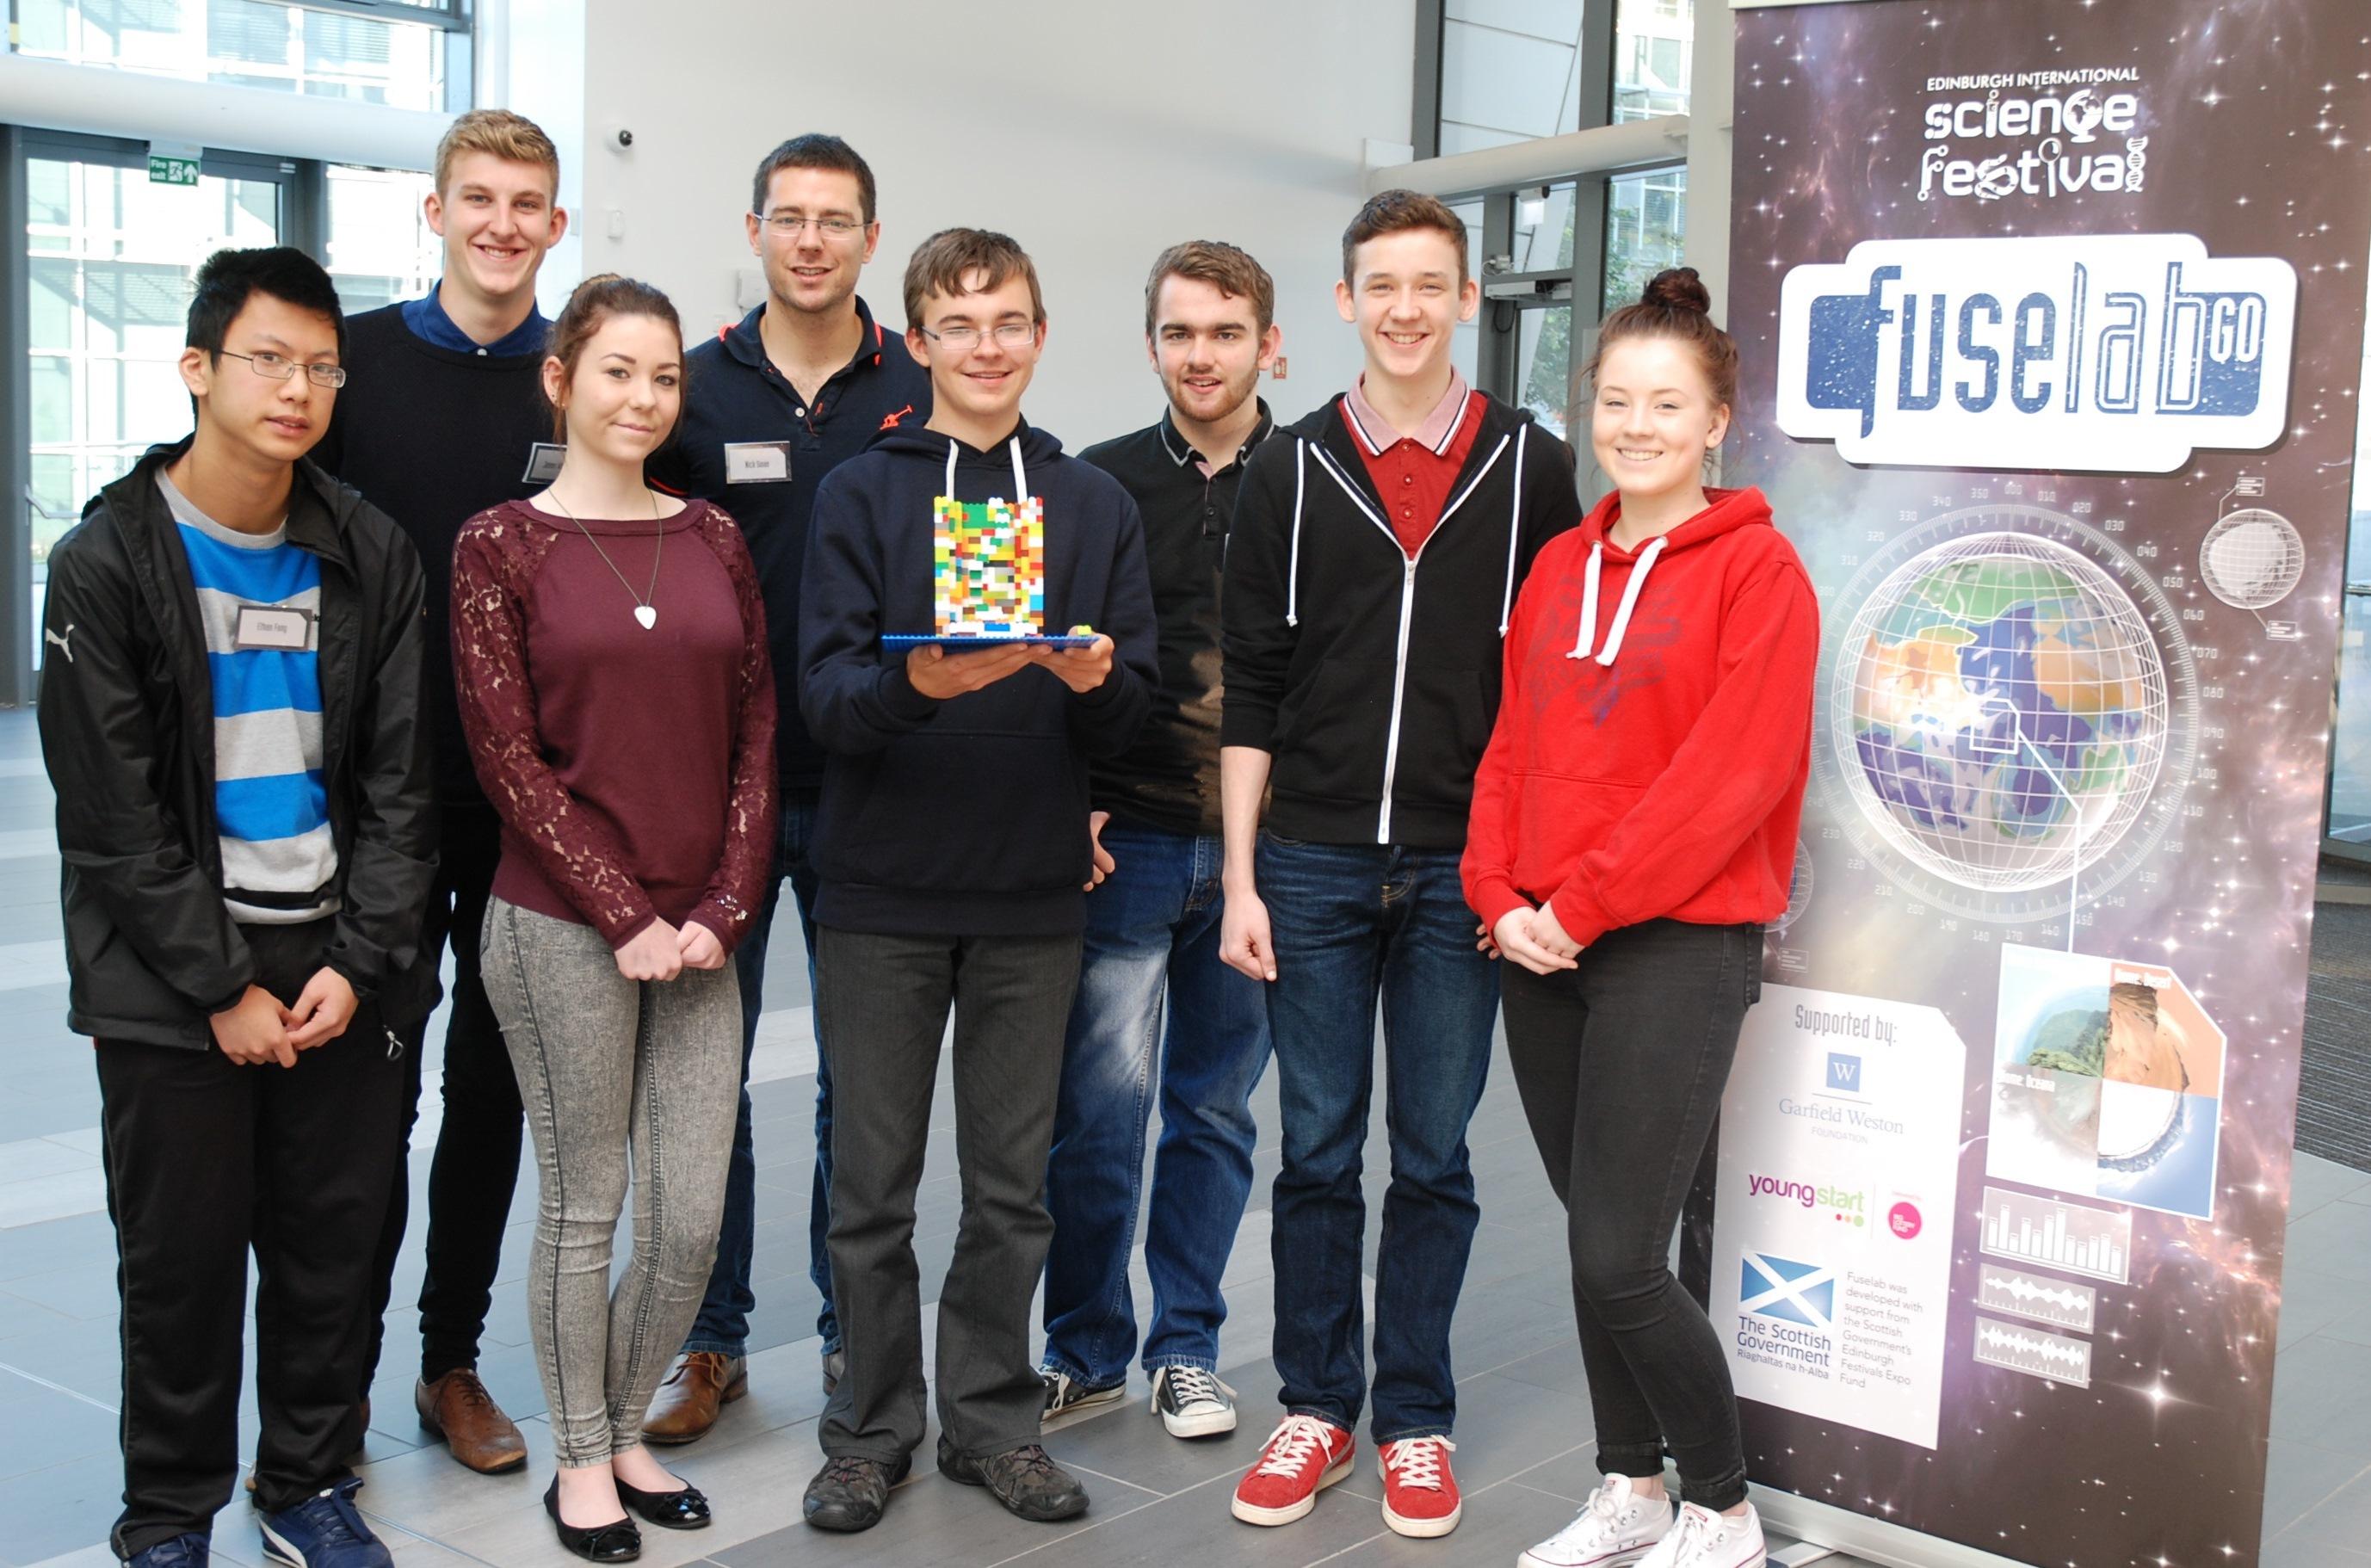 Aberdeen pupils:  Ethan Fong, Sarah McGuckin, Ewan Harold, Robert Rosie, Jake Adcook, Cameron Fraser-Mackie with mentors Nick Swan and James Williams (both back left)